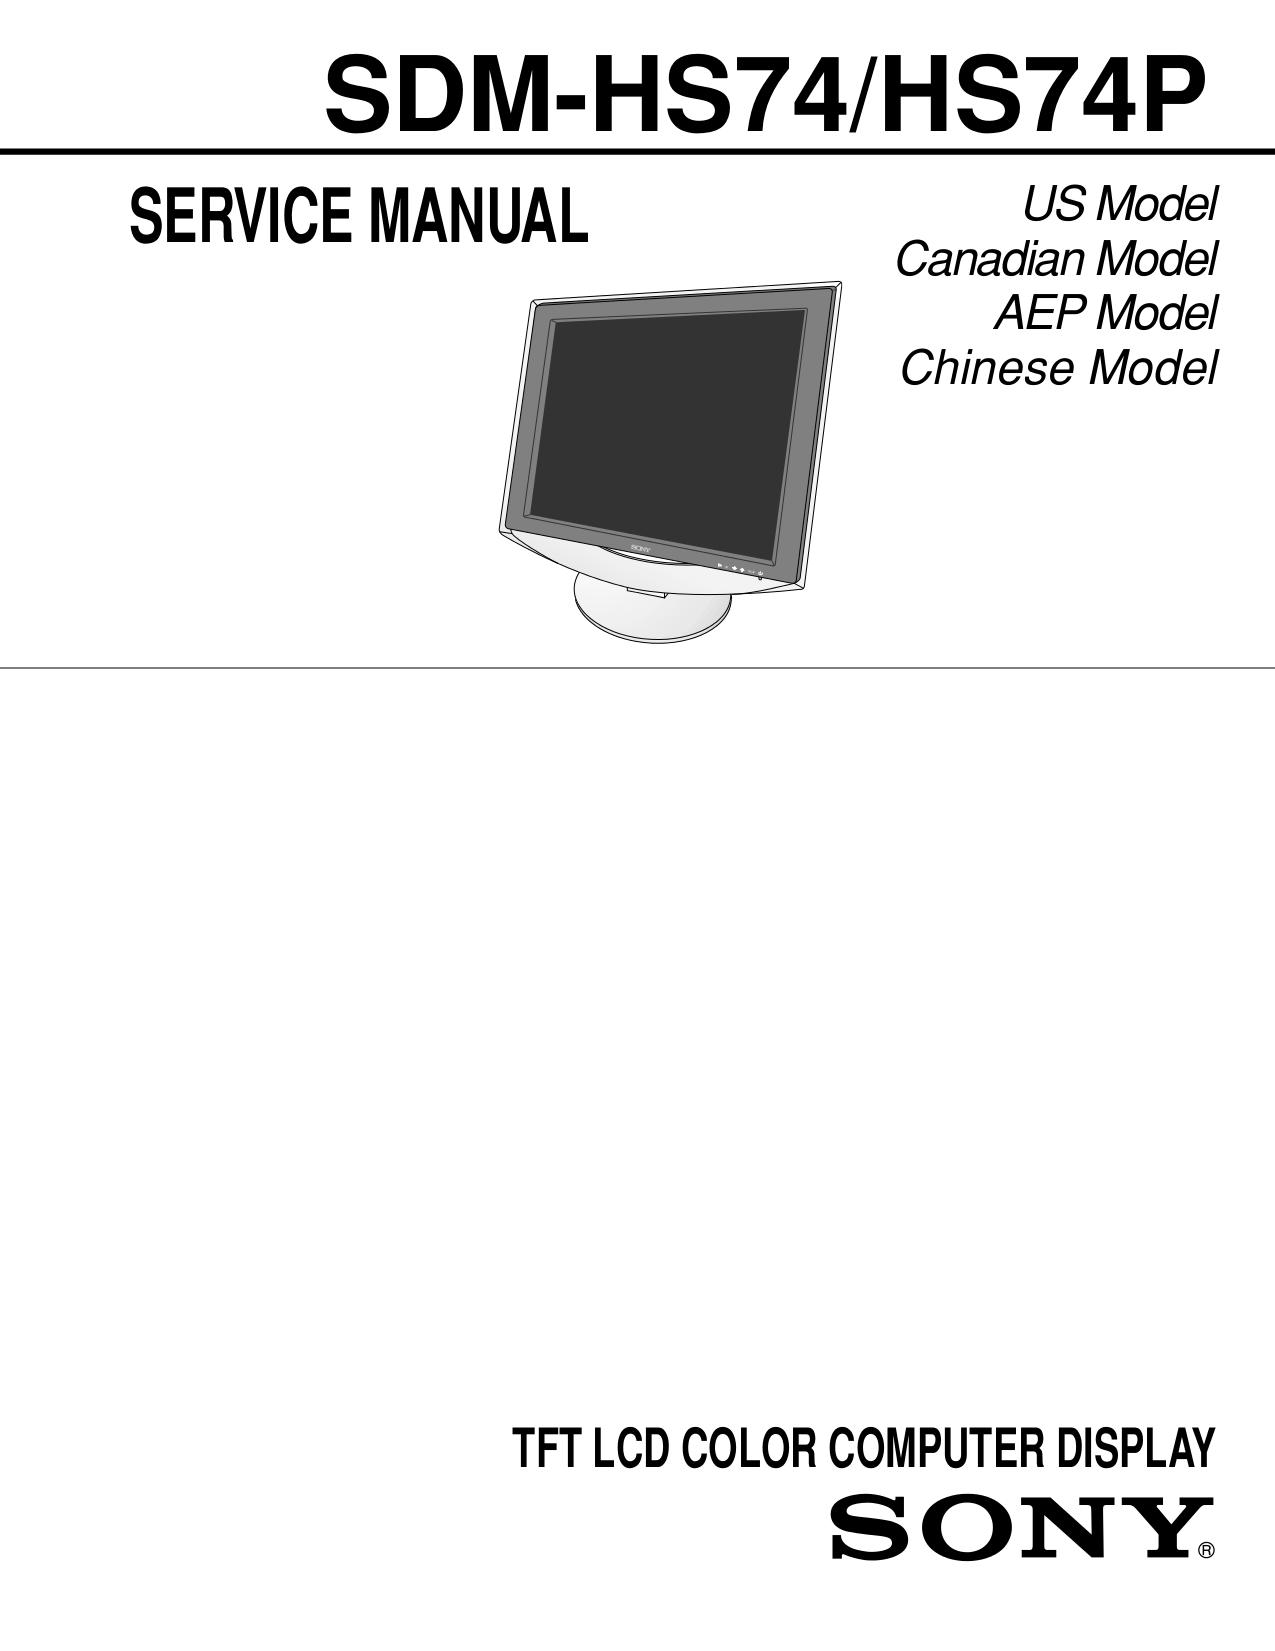 pdf for Sony Monitor SDM-HS74P manual